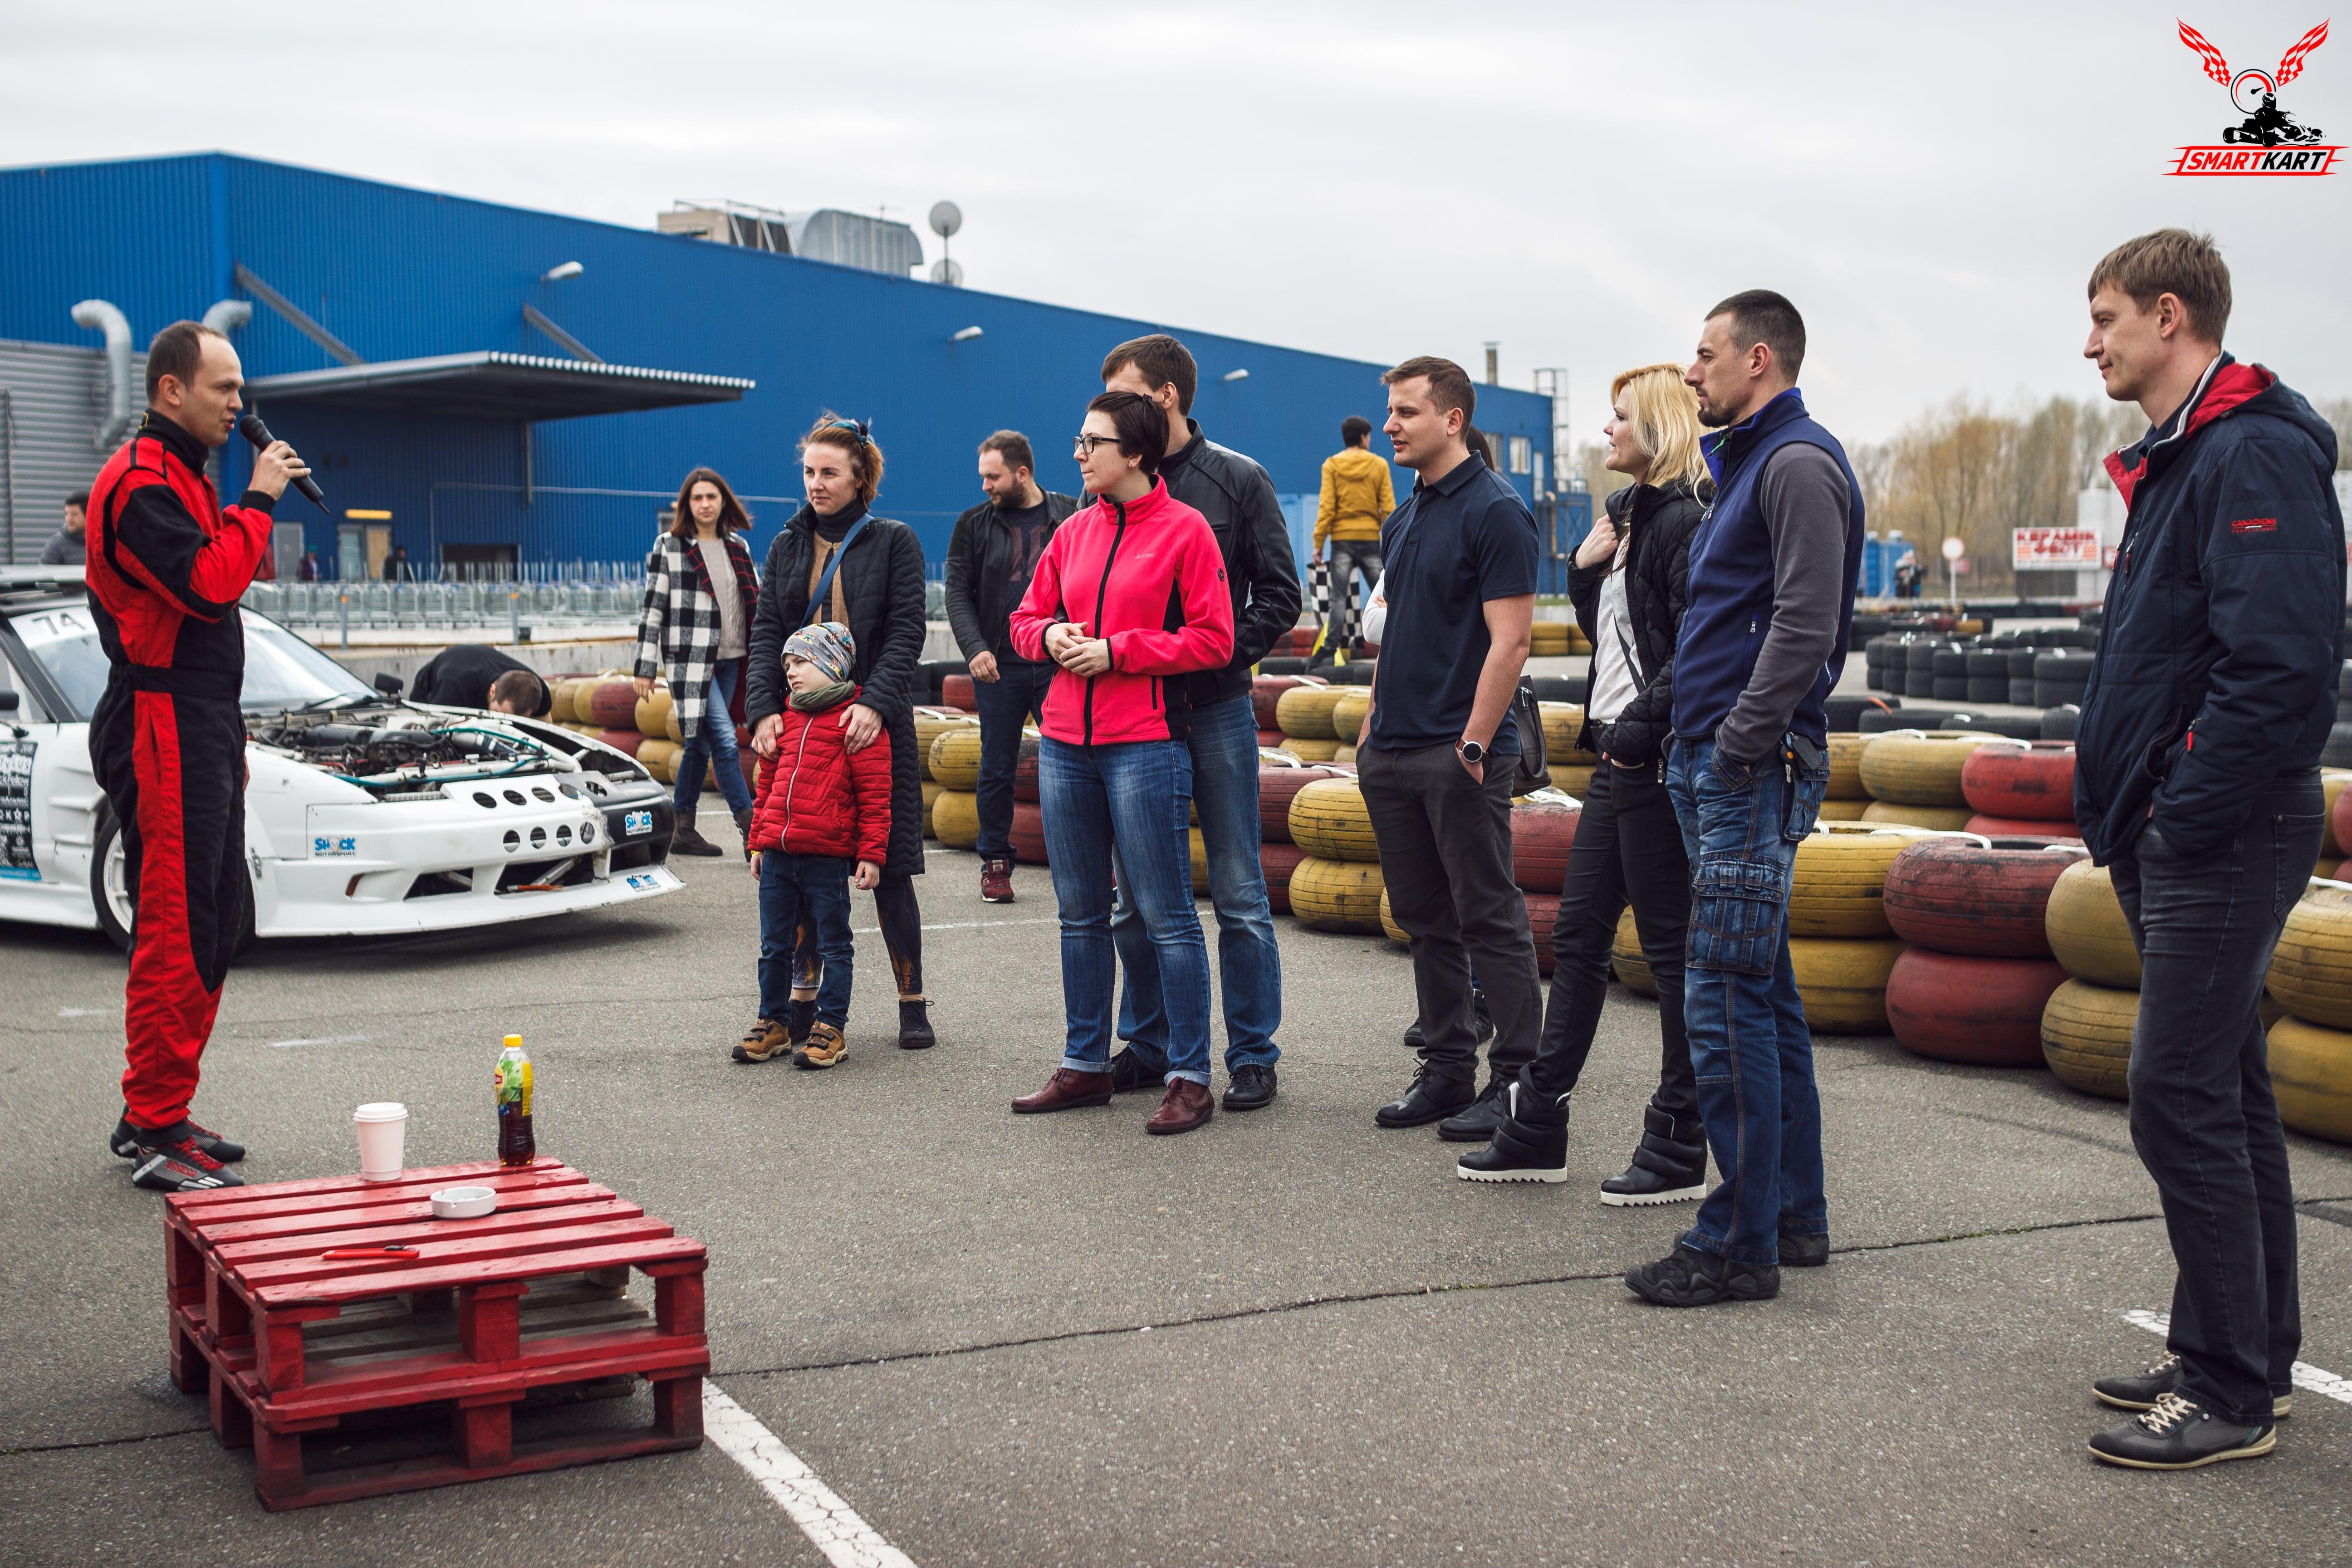 Smart-karting-foto11